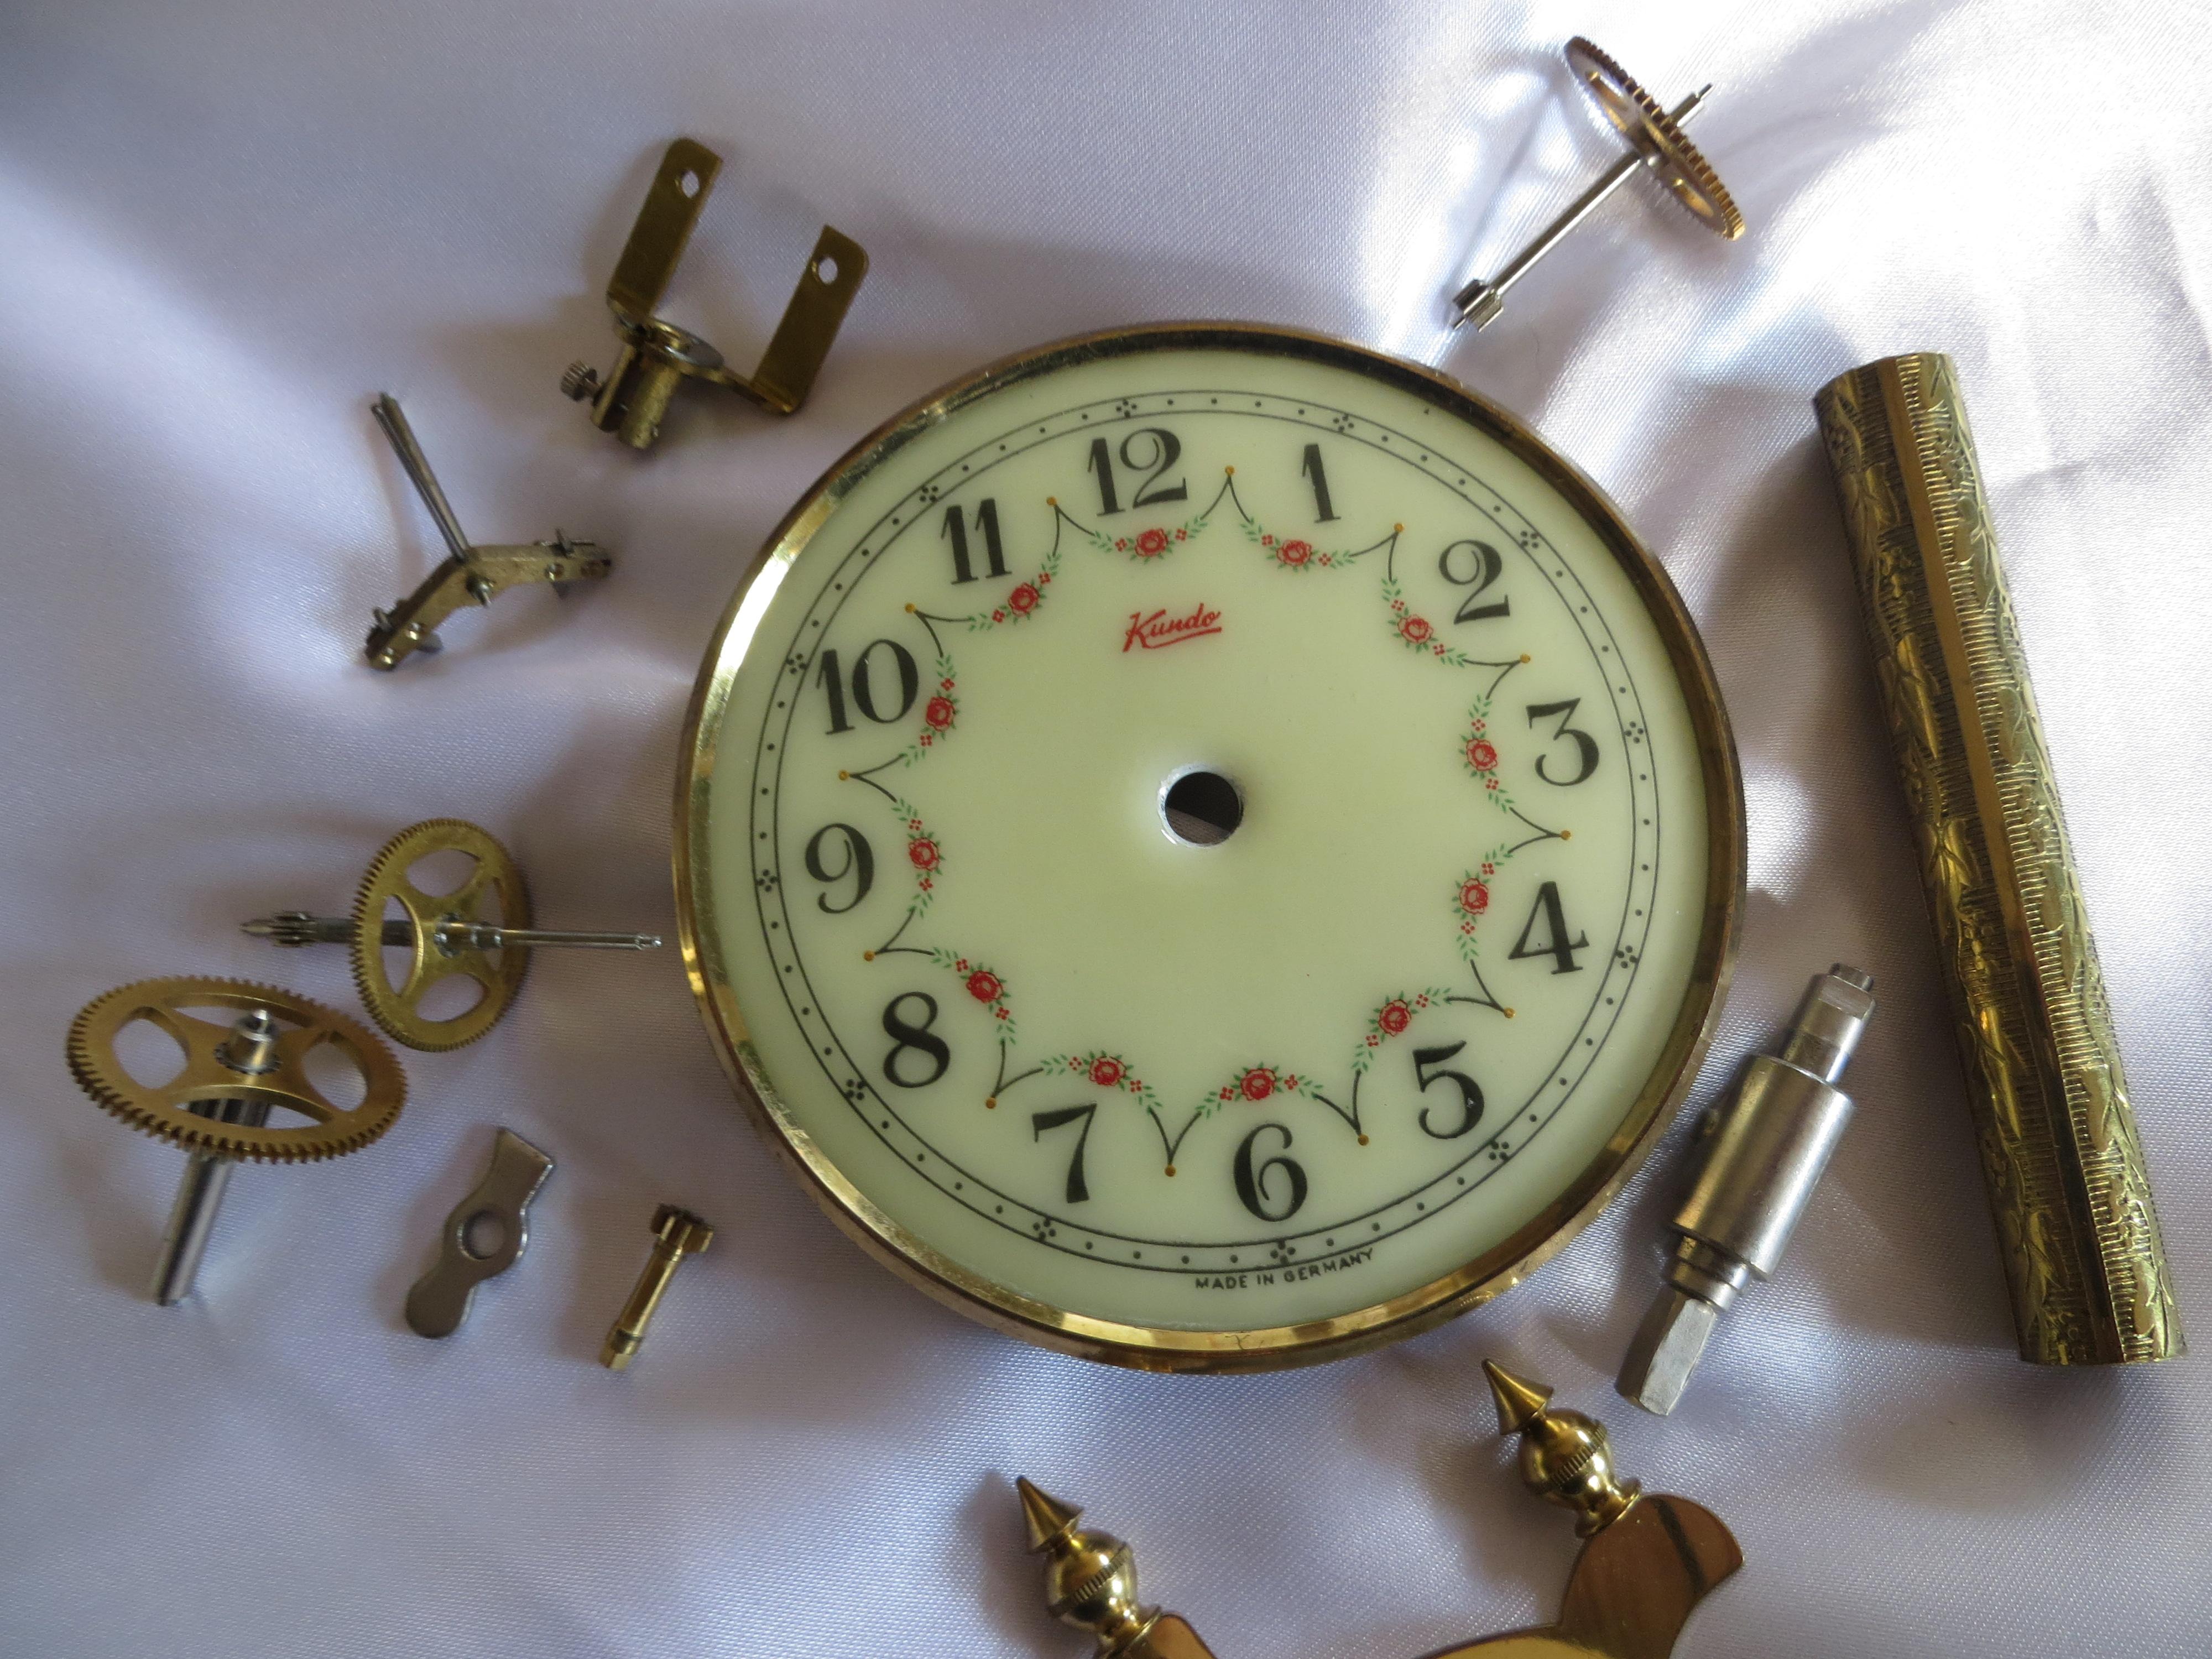 Diagram Of An Anniversary Clock Repair Wiring Scheme